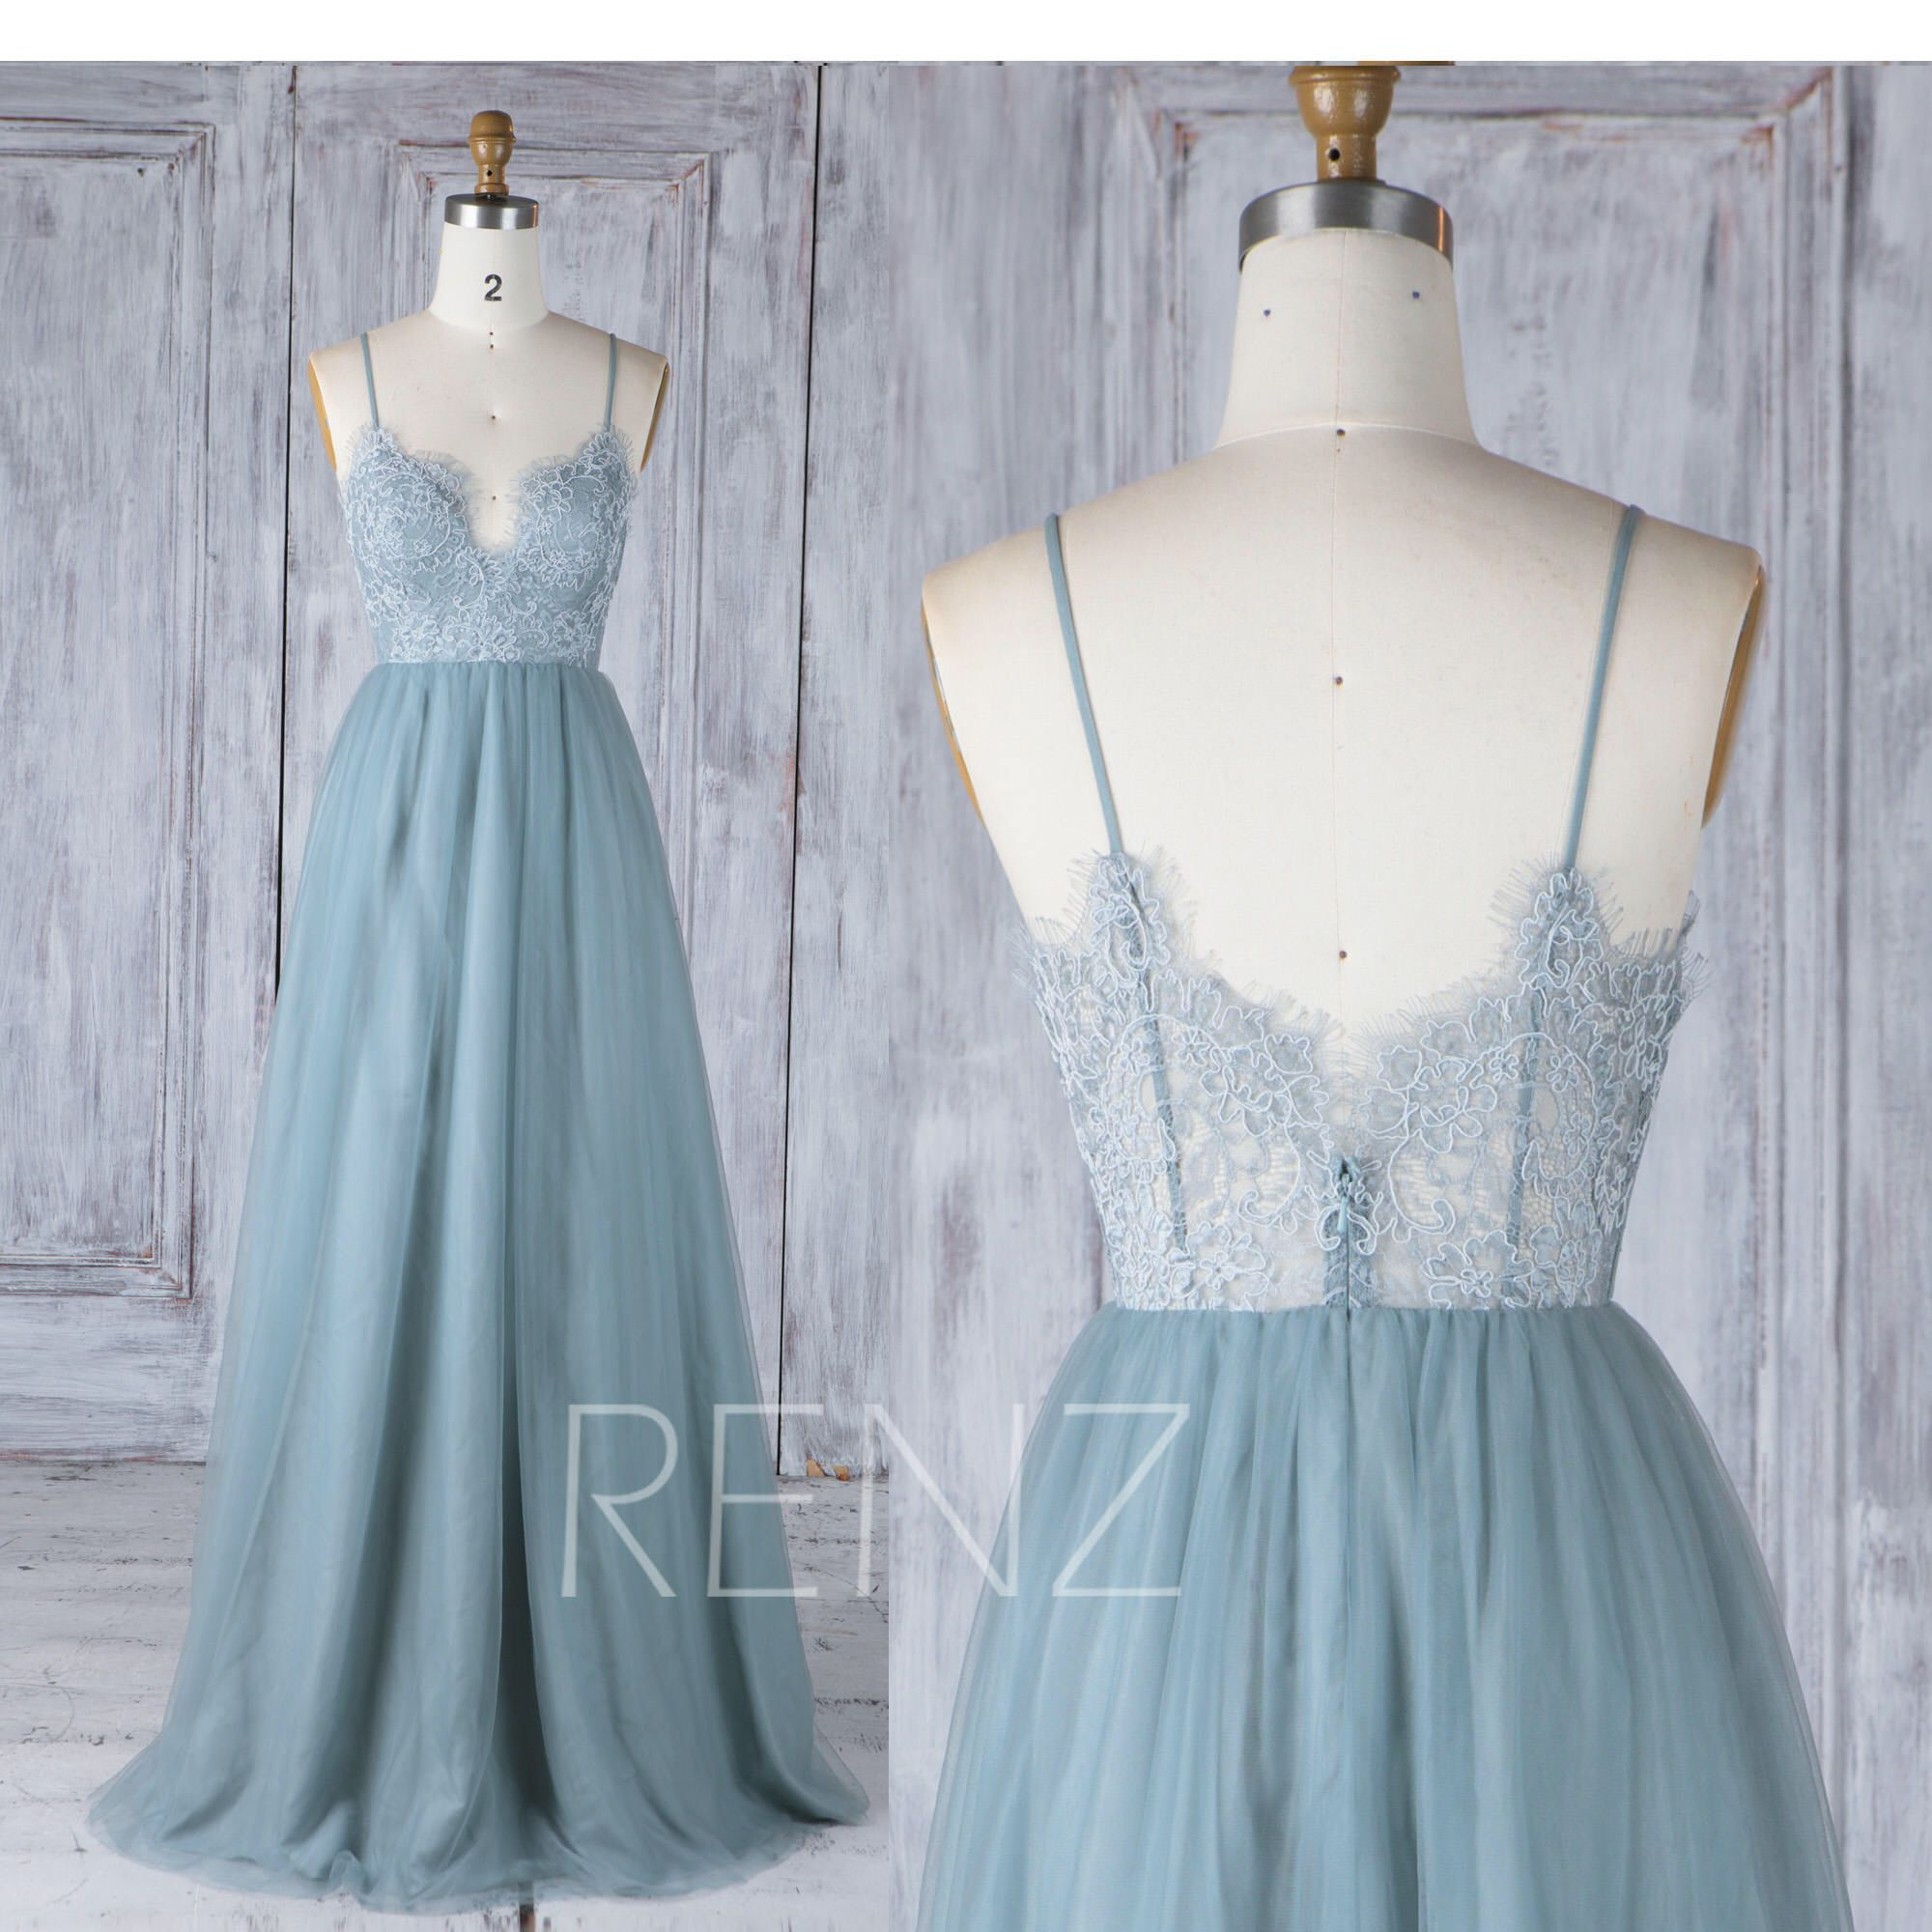 Bridesmaid dress dusty blue tulle dresswedding dresslace illusion